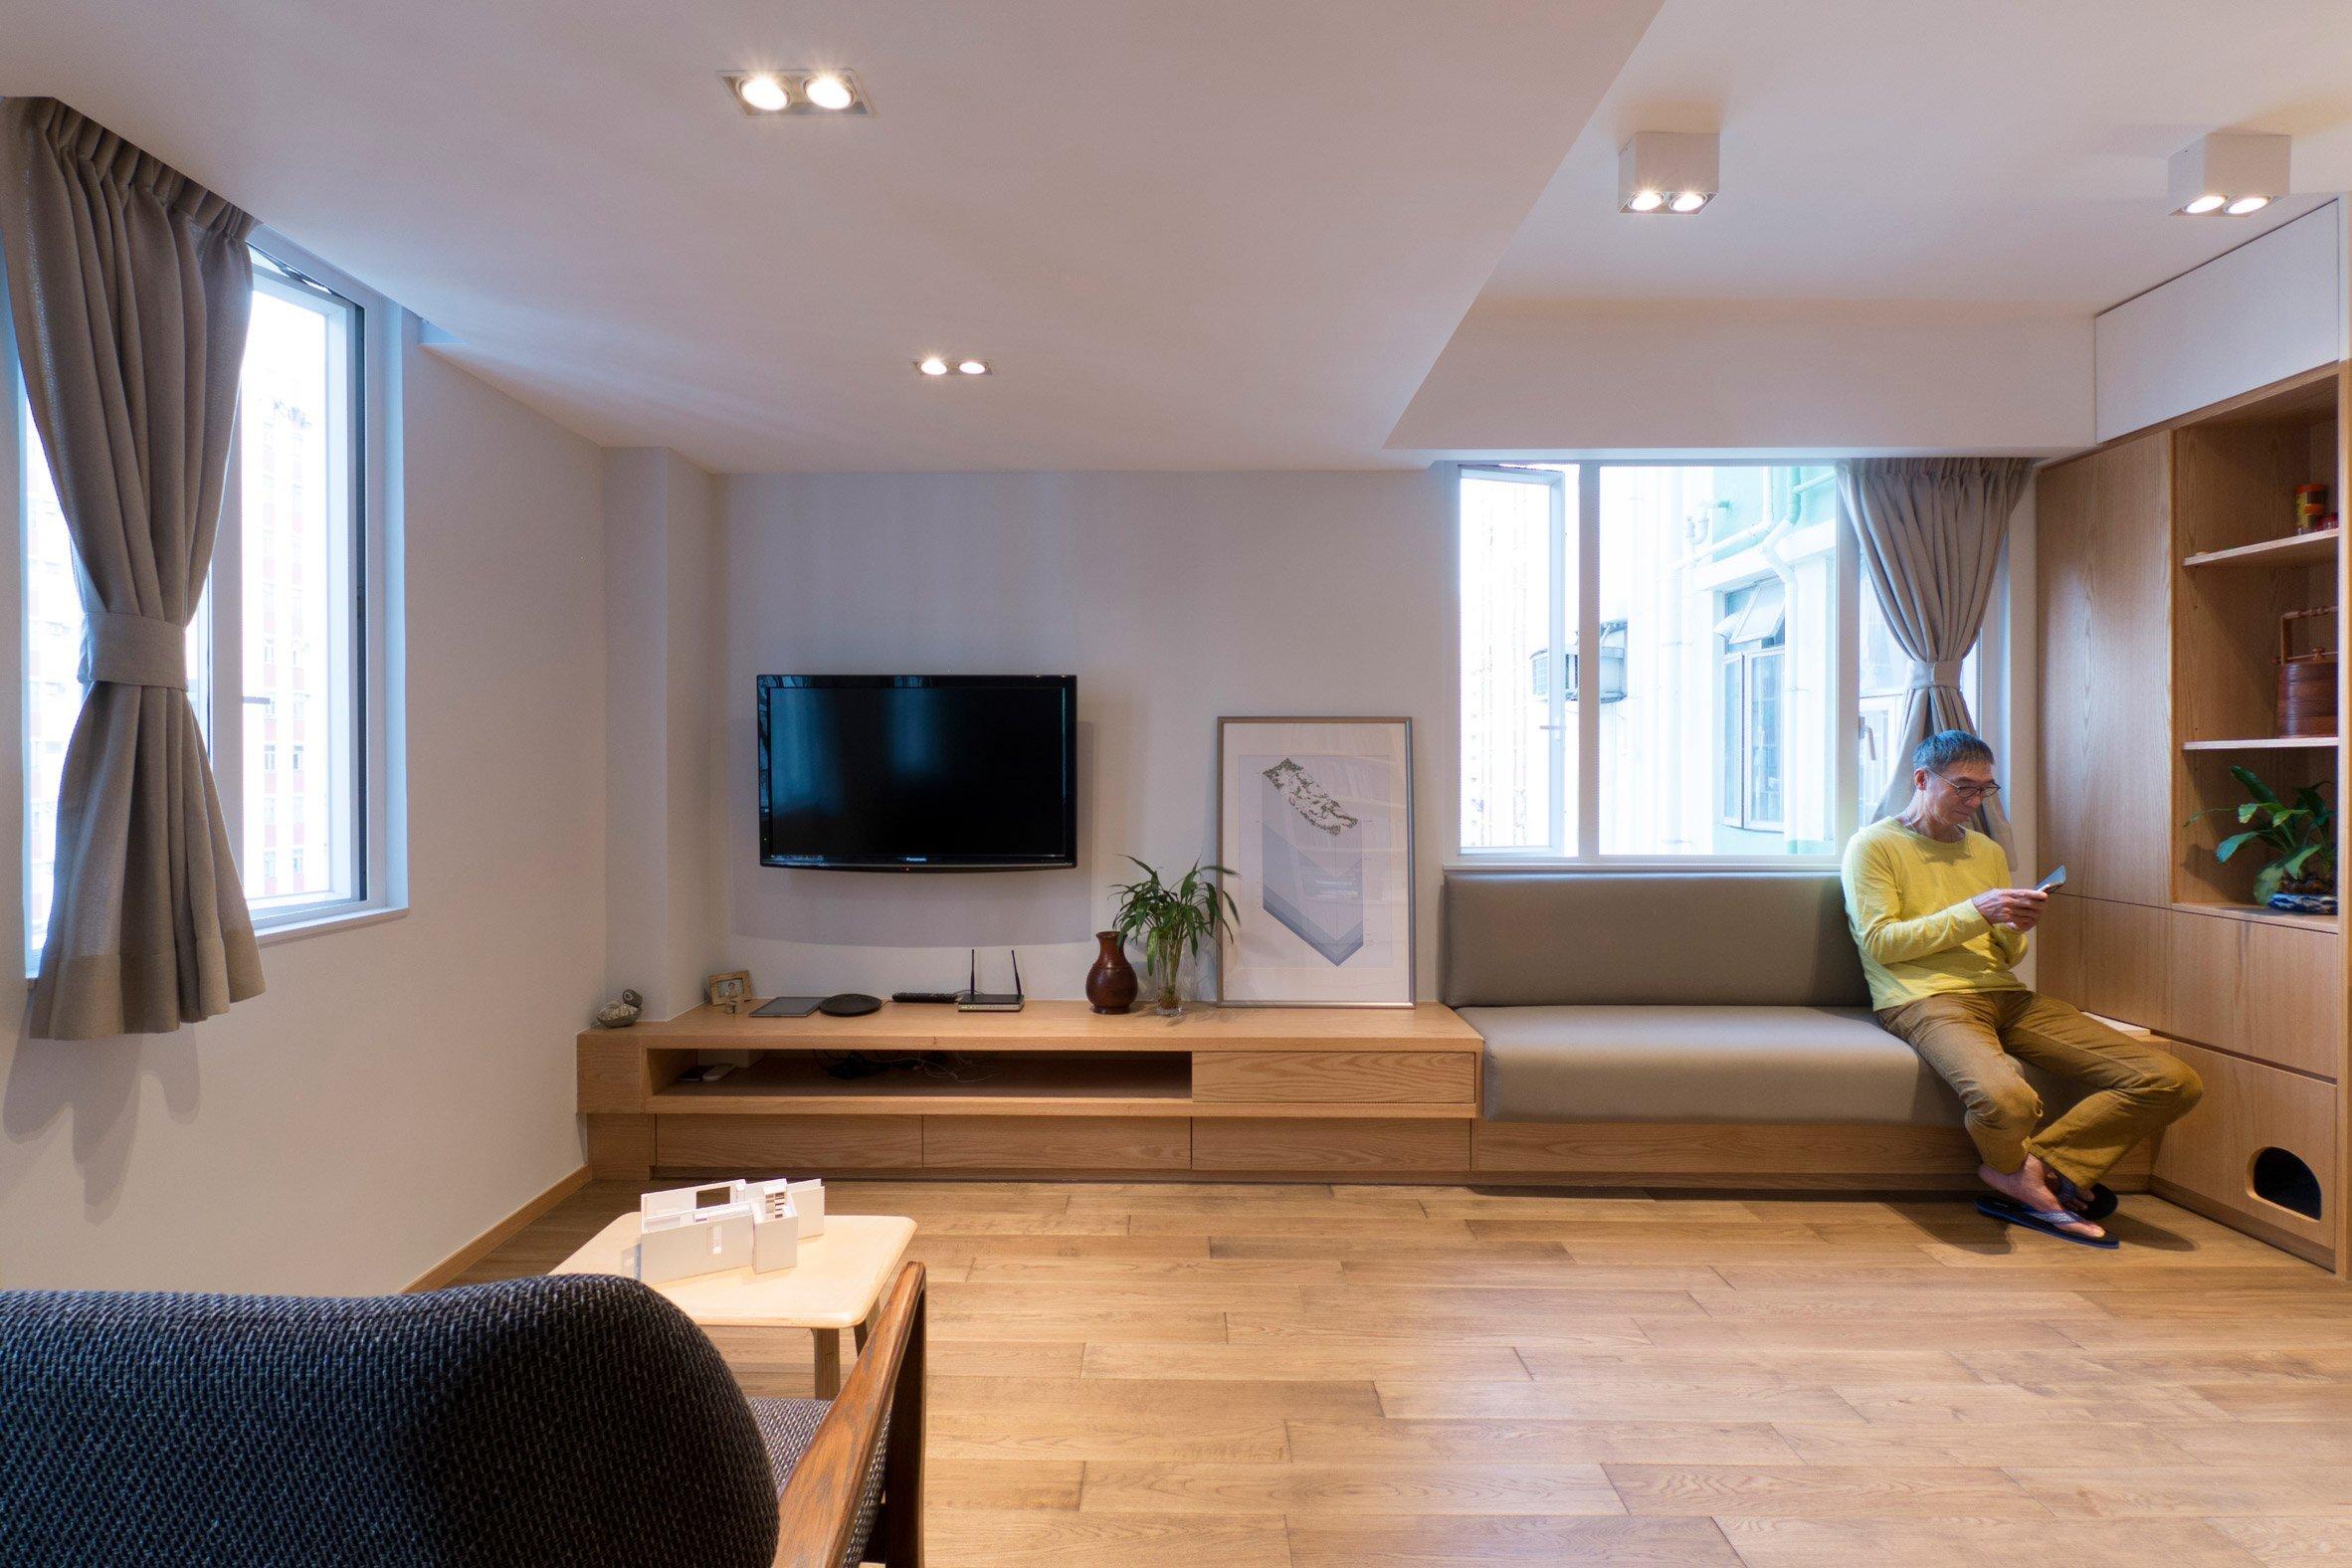 Flat 27A - Design Eight Five Two - Hong Kong - TV and Sofa - Humble Homes